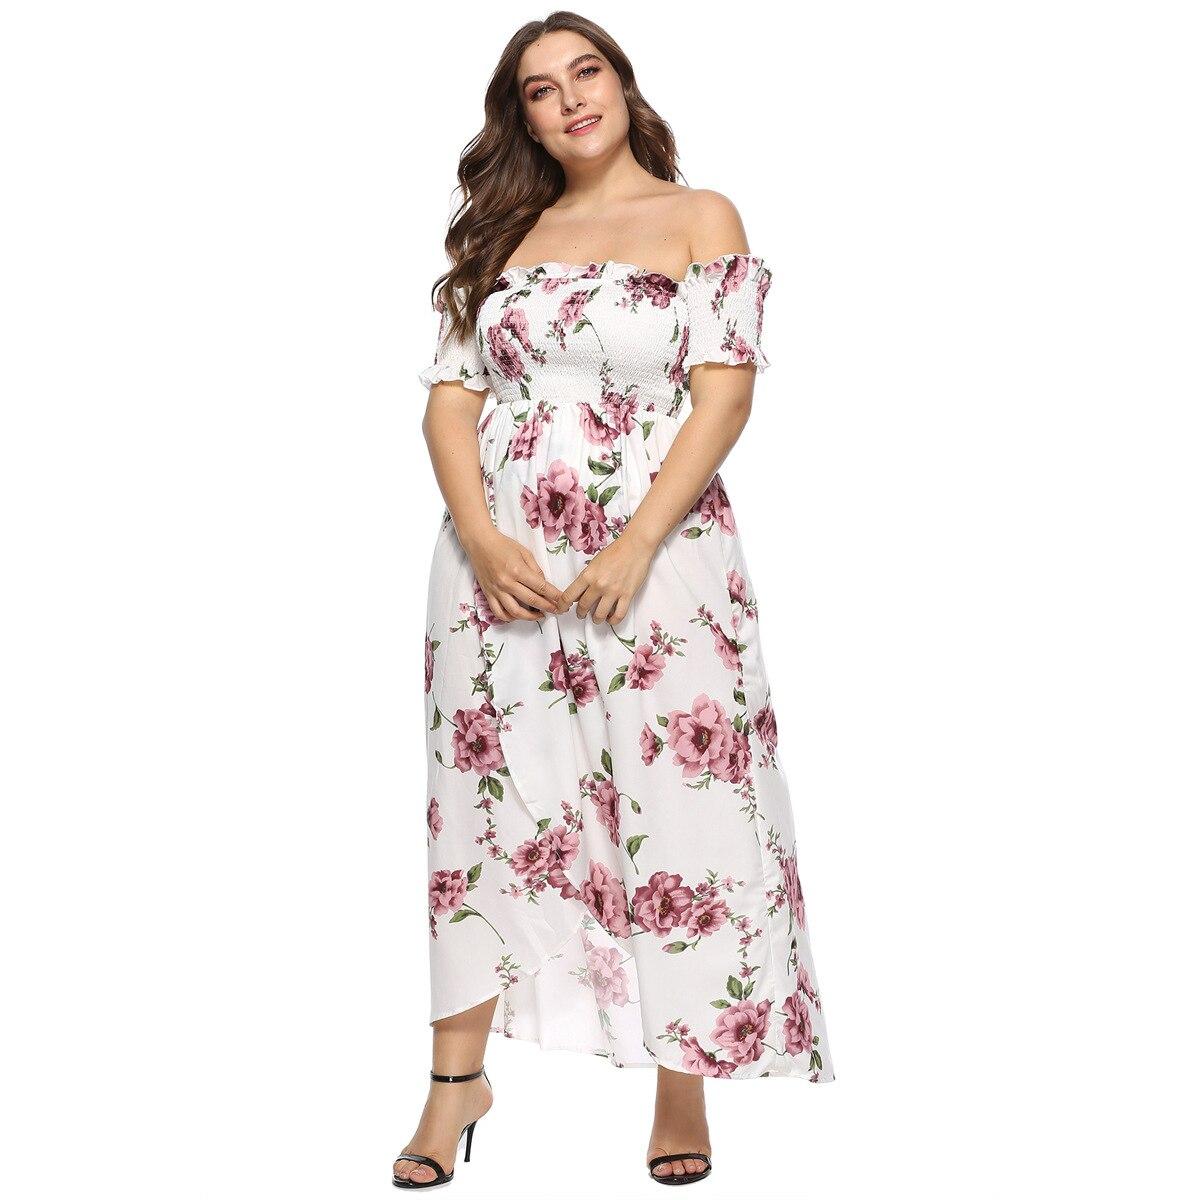 Fashion Bohemian Plus Size 4XL Womens Dress Slash Neck  Short Sleeve Printed Floral White